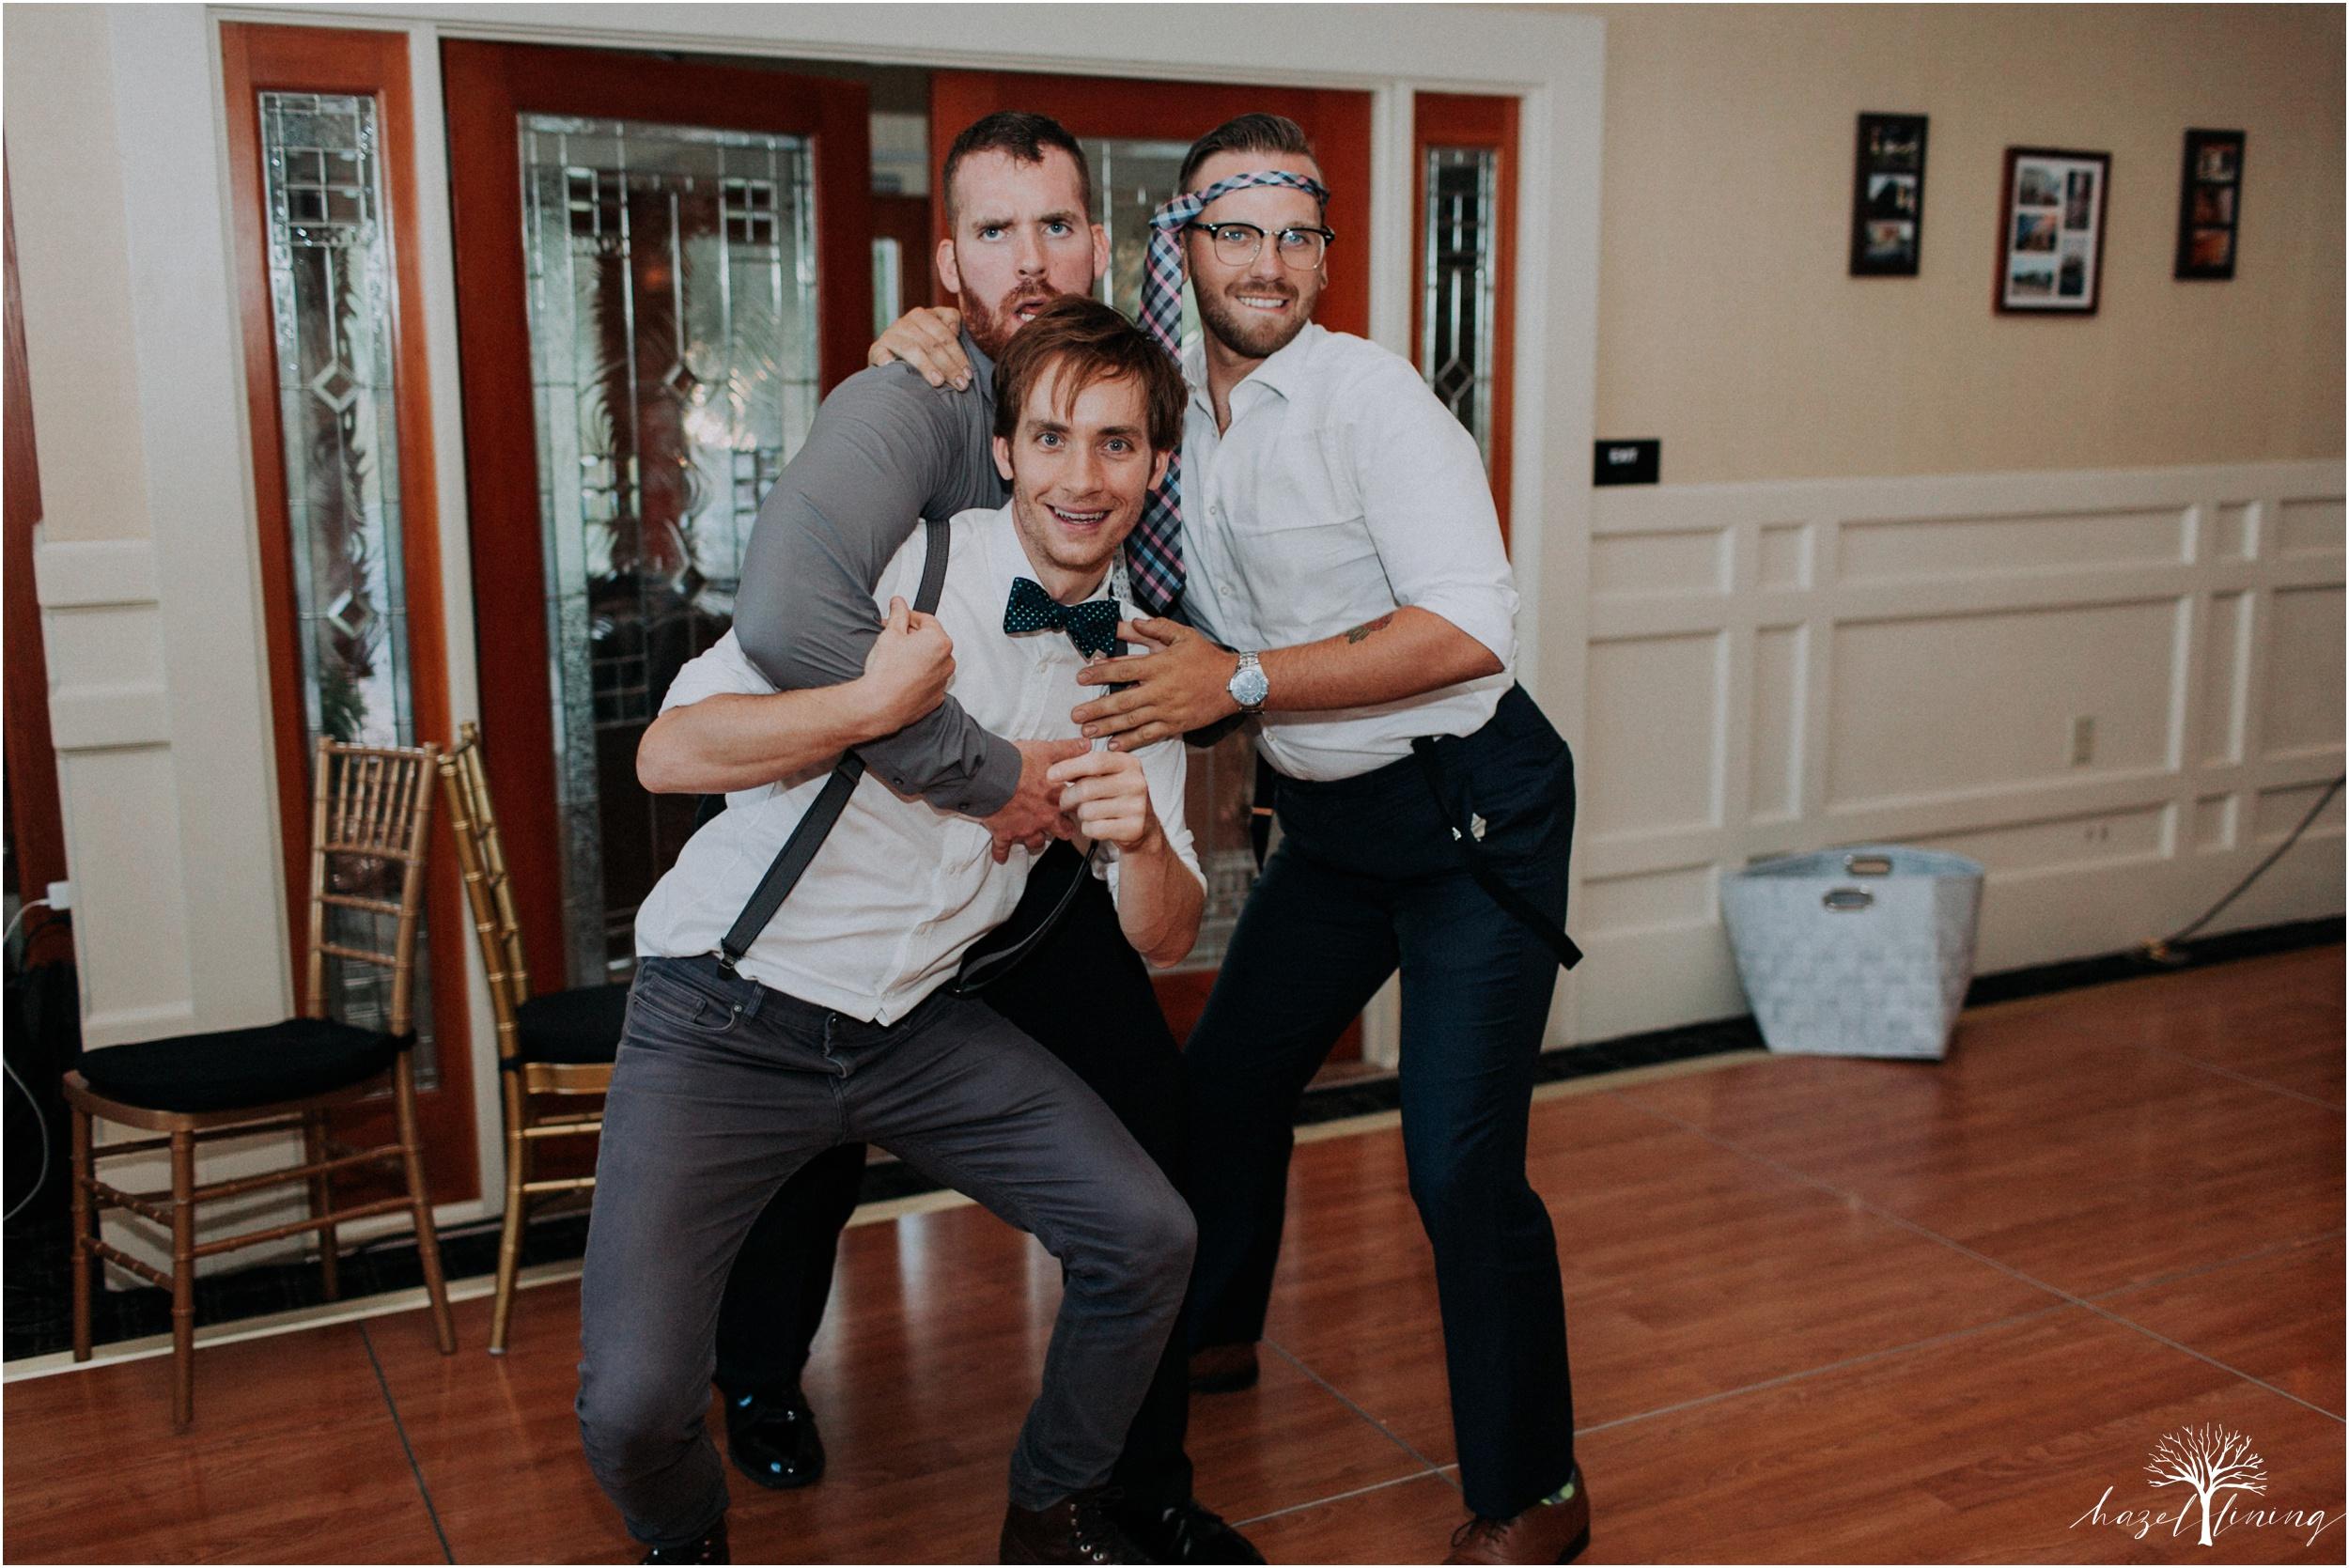 alyssa-james-stiteler-wedding-loft-and-sweet-water-cc-pennsburg-pennsylvania-hazel-lining-travel-wedding-elopement-photography_0140.jpg